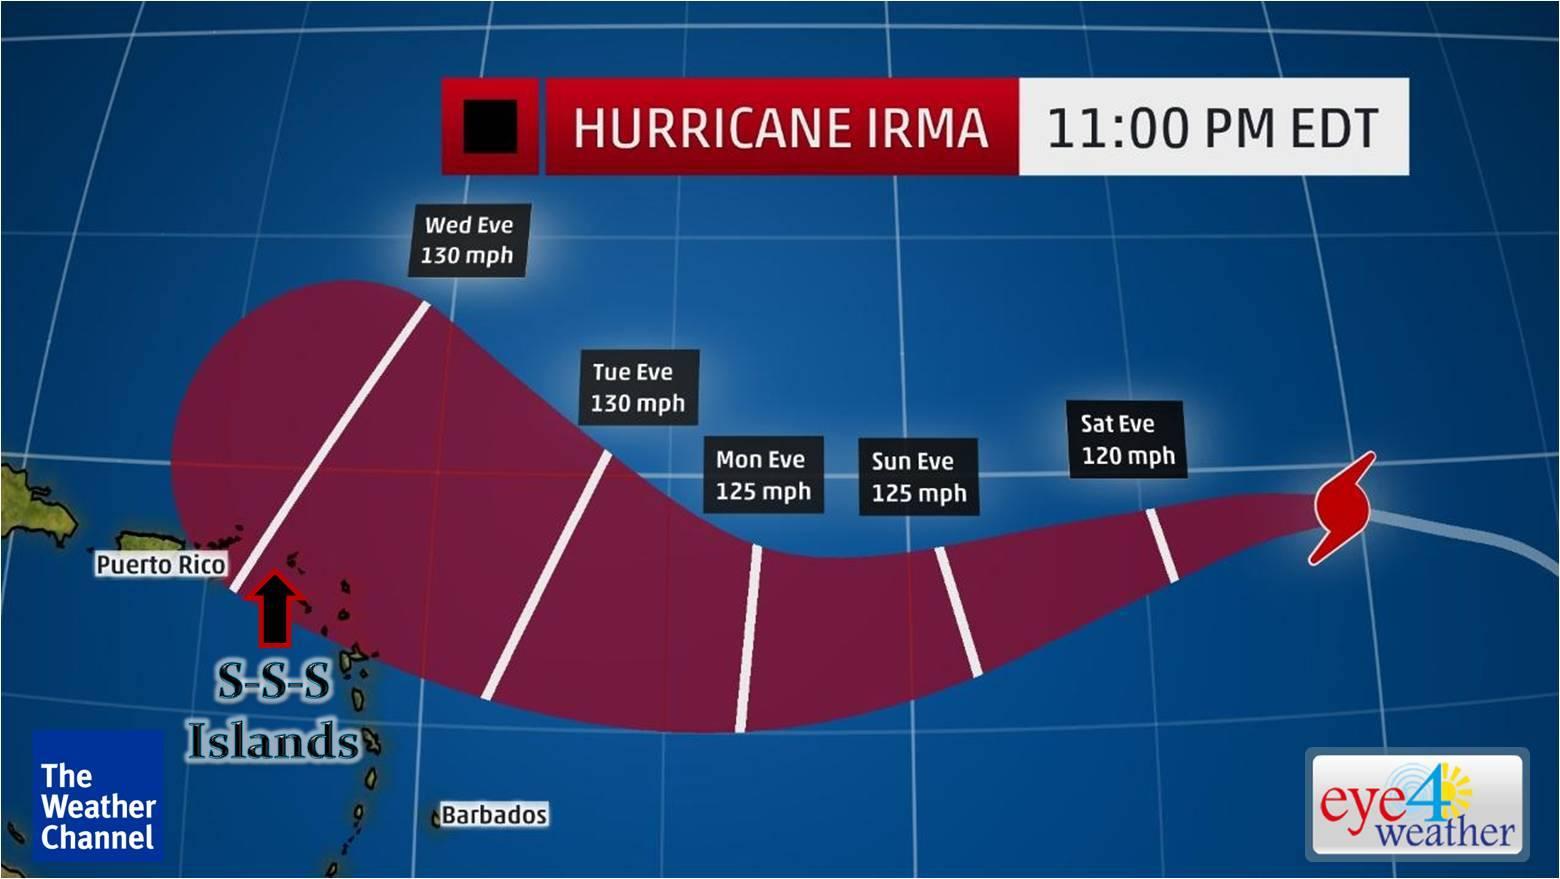 Latest Hurricane Irma, St Maarten The Caribbean Eye 4 Weather News